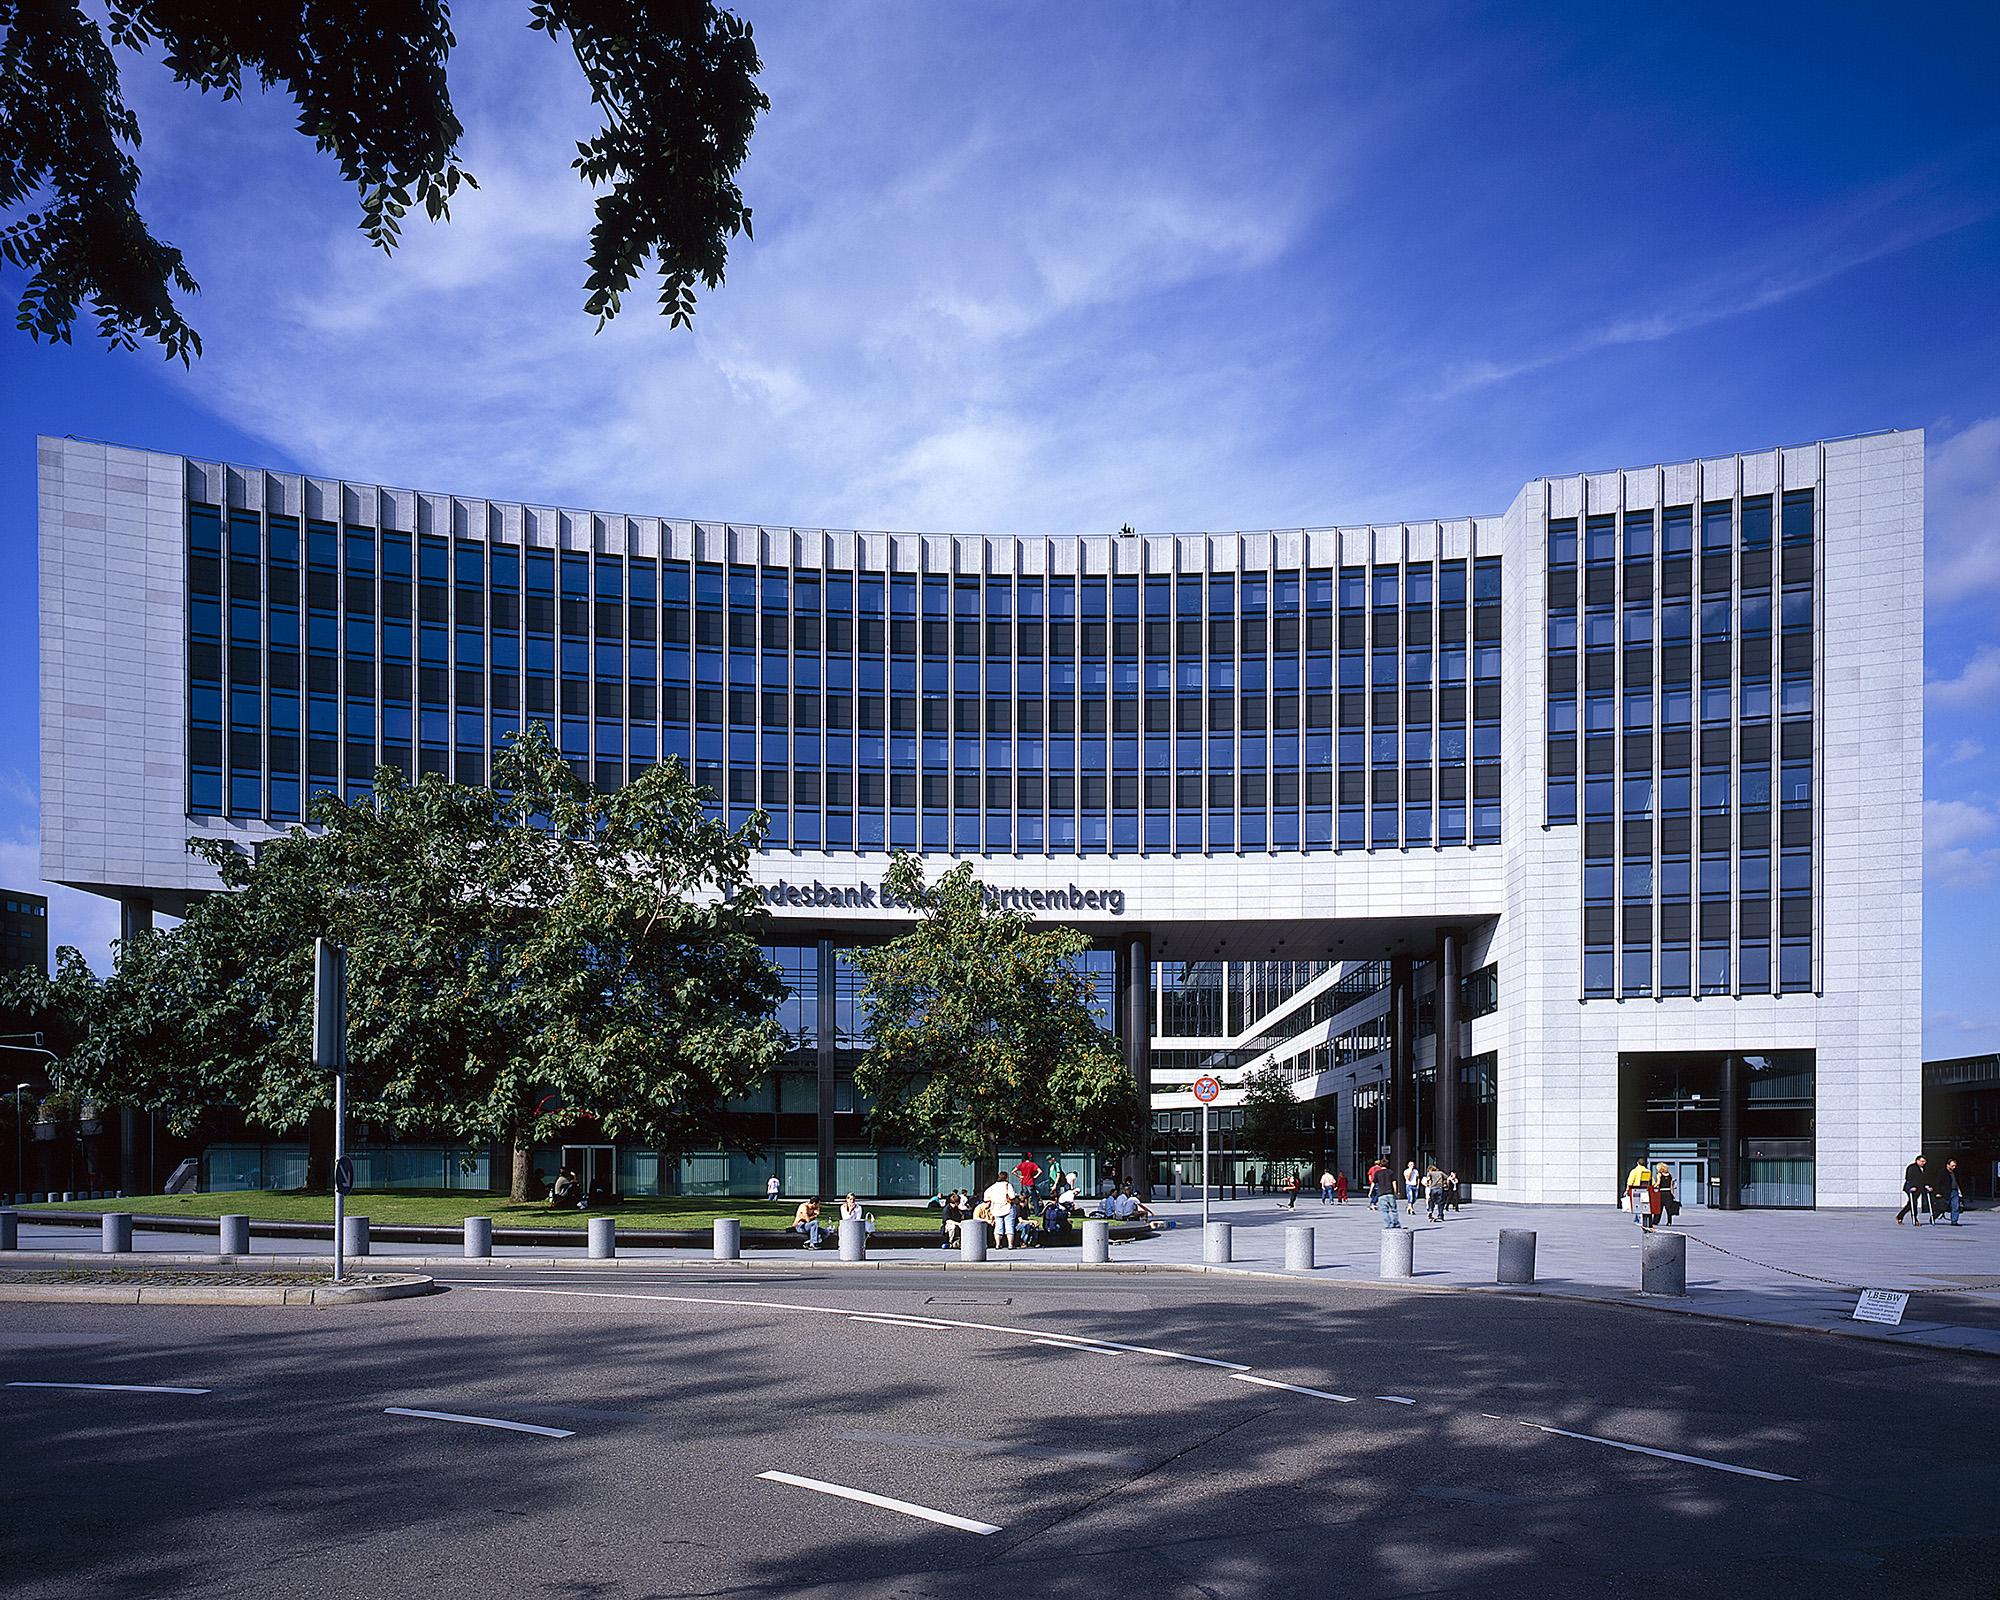 Lbbw Bank Stuttgart